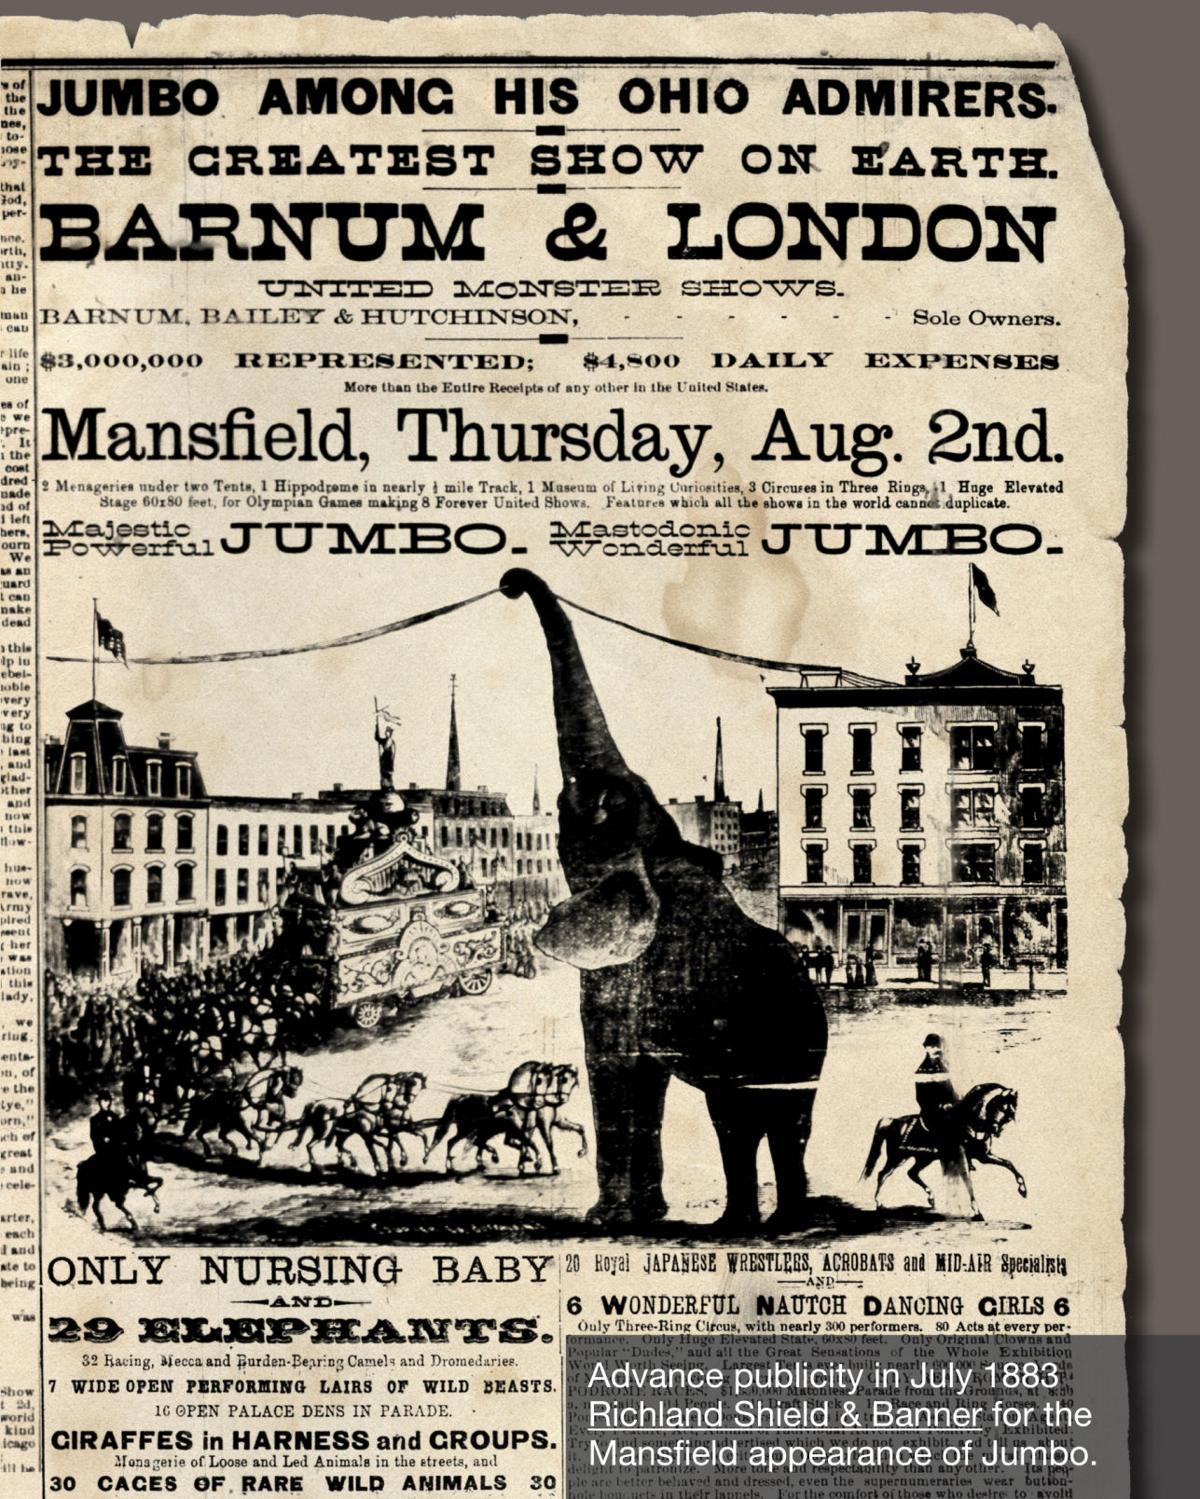 Jumbo Mansfield promo